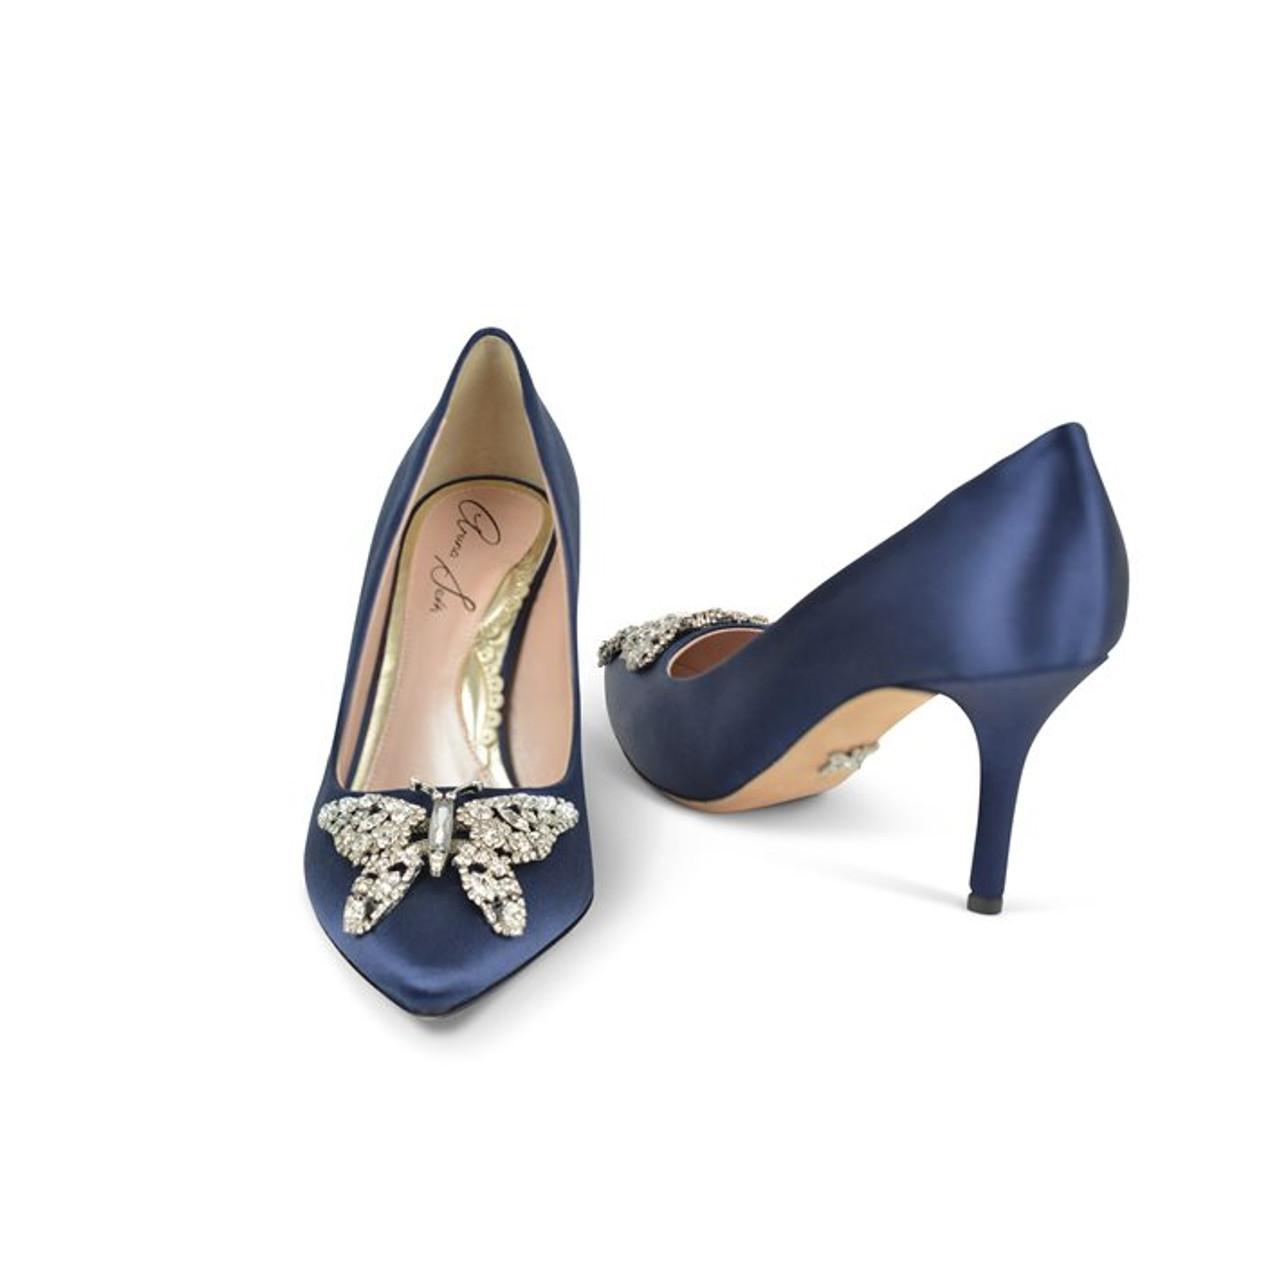 Emilia Farfalla Stiletto Navy Blue